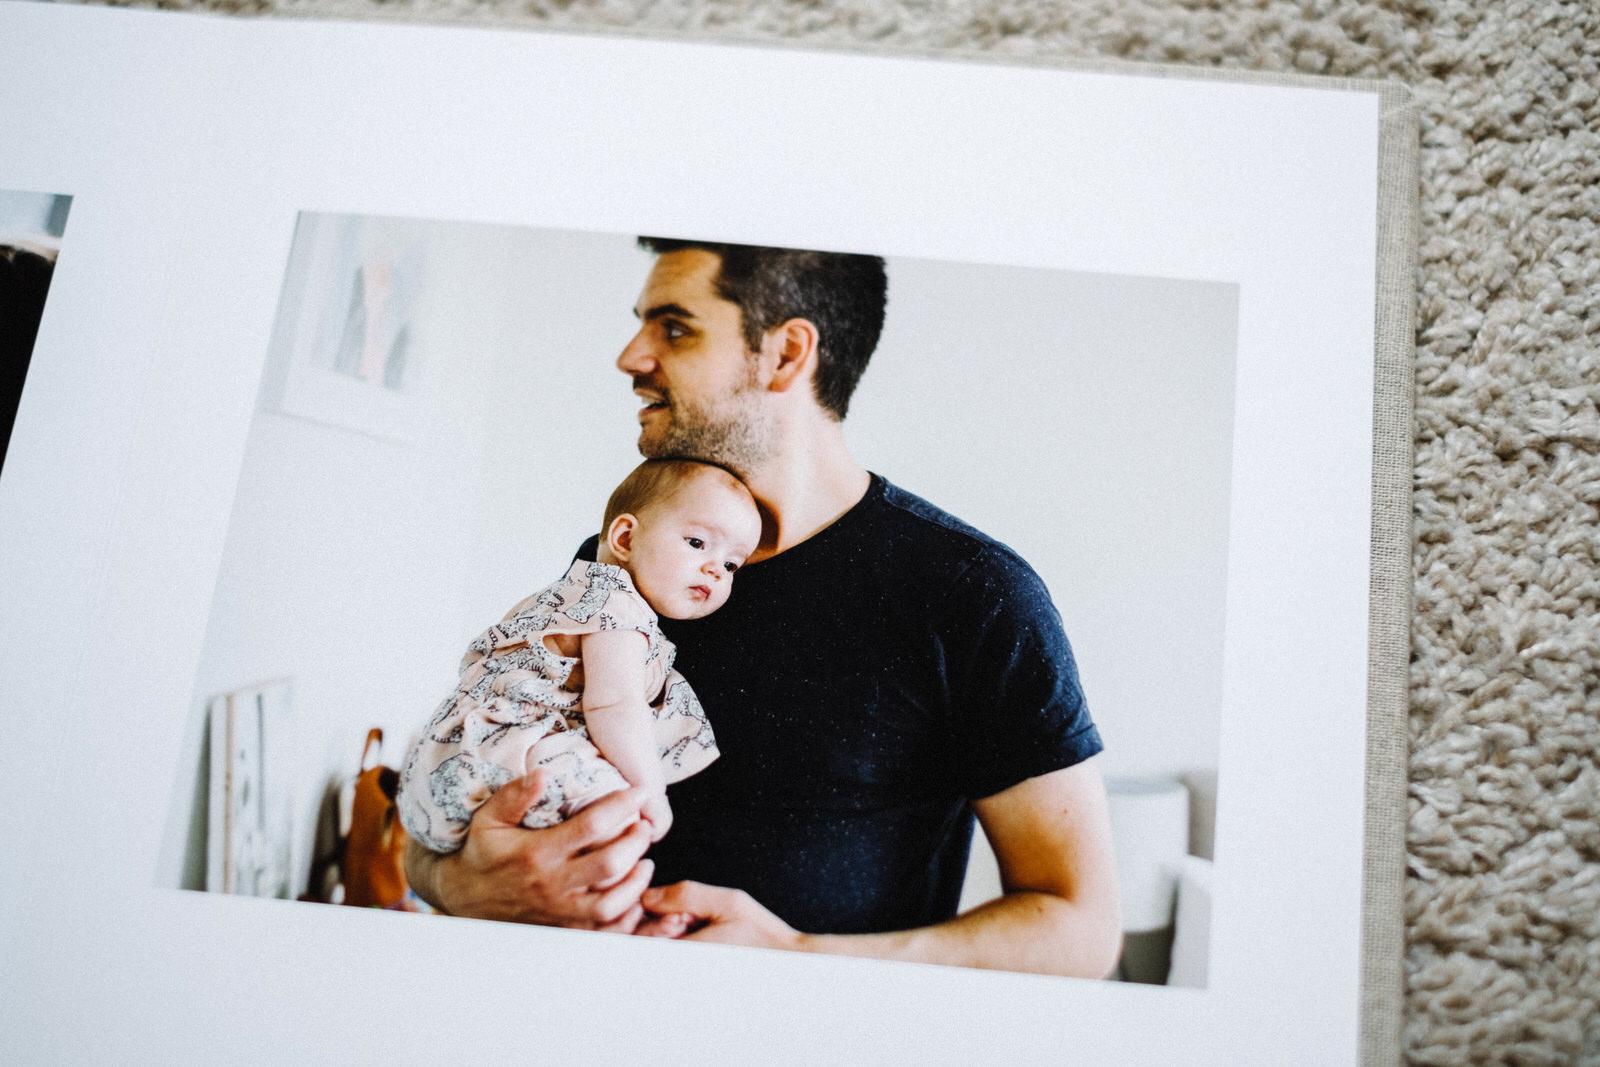 family-story-photos-photo-album-14.jpg